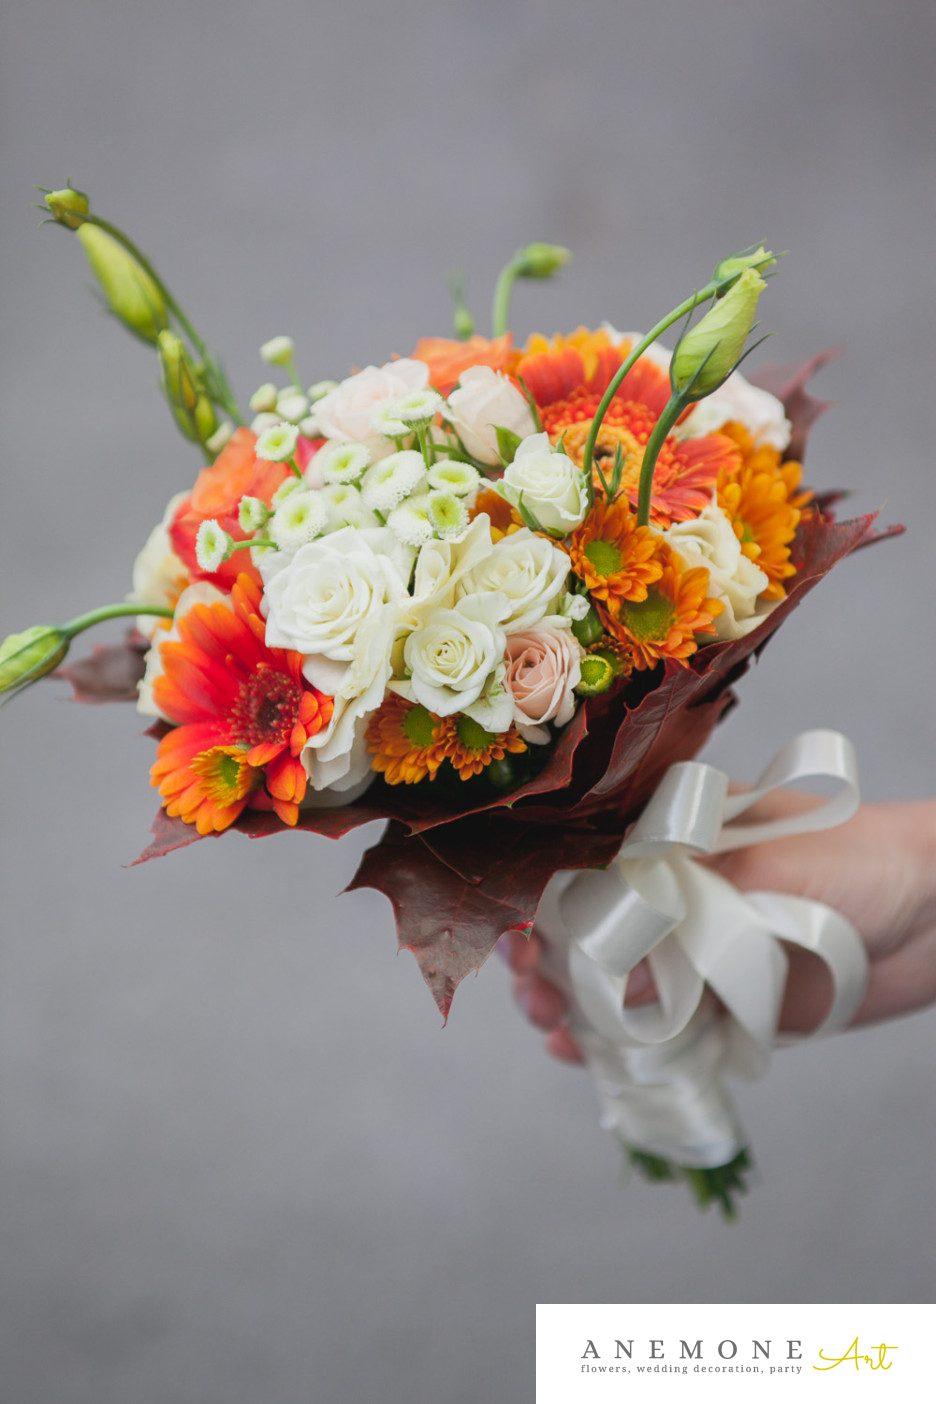 Poza, foto cu Flori de nunta buchet nasa, crem, lisianthus, maro, matricaria eximia, mini-gerbera, mini-rosa, portocaliu in Arad, Timisoara, Oradea (wedding flowers, bouquets) nunta Arad, Timisoara, Oradea